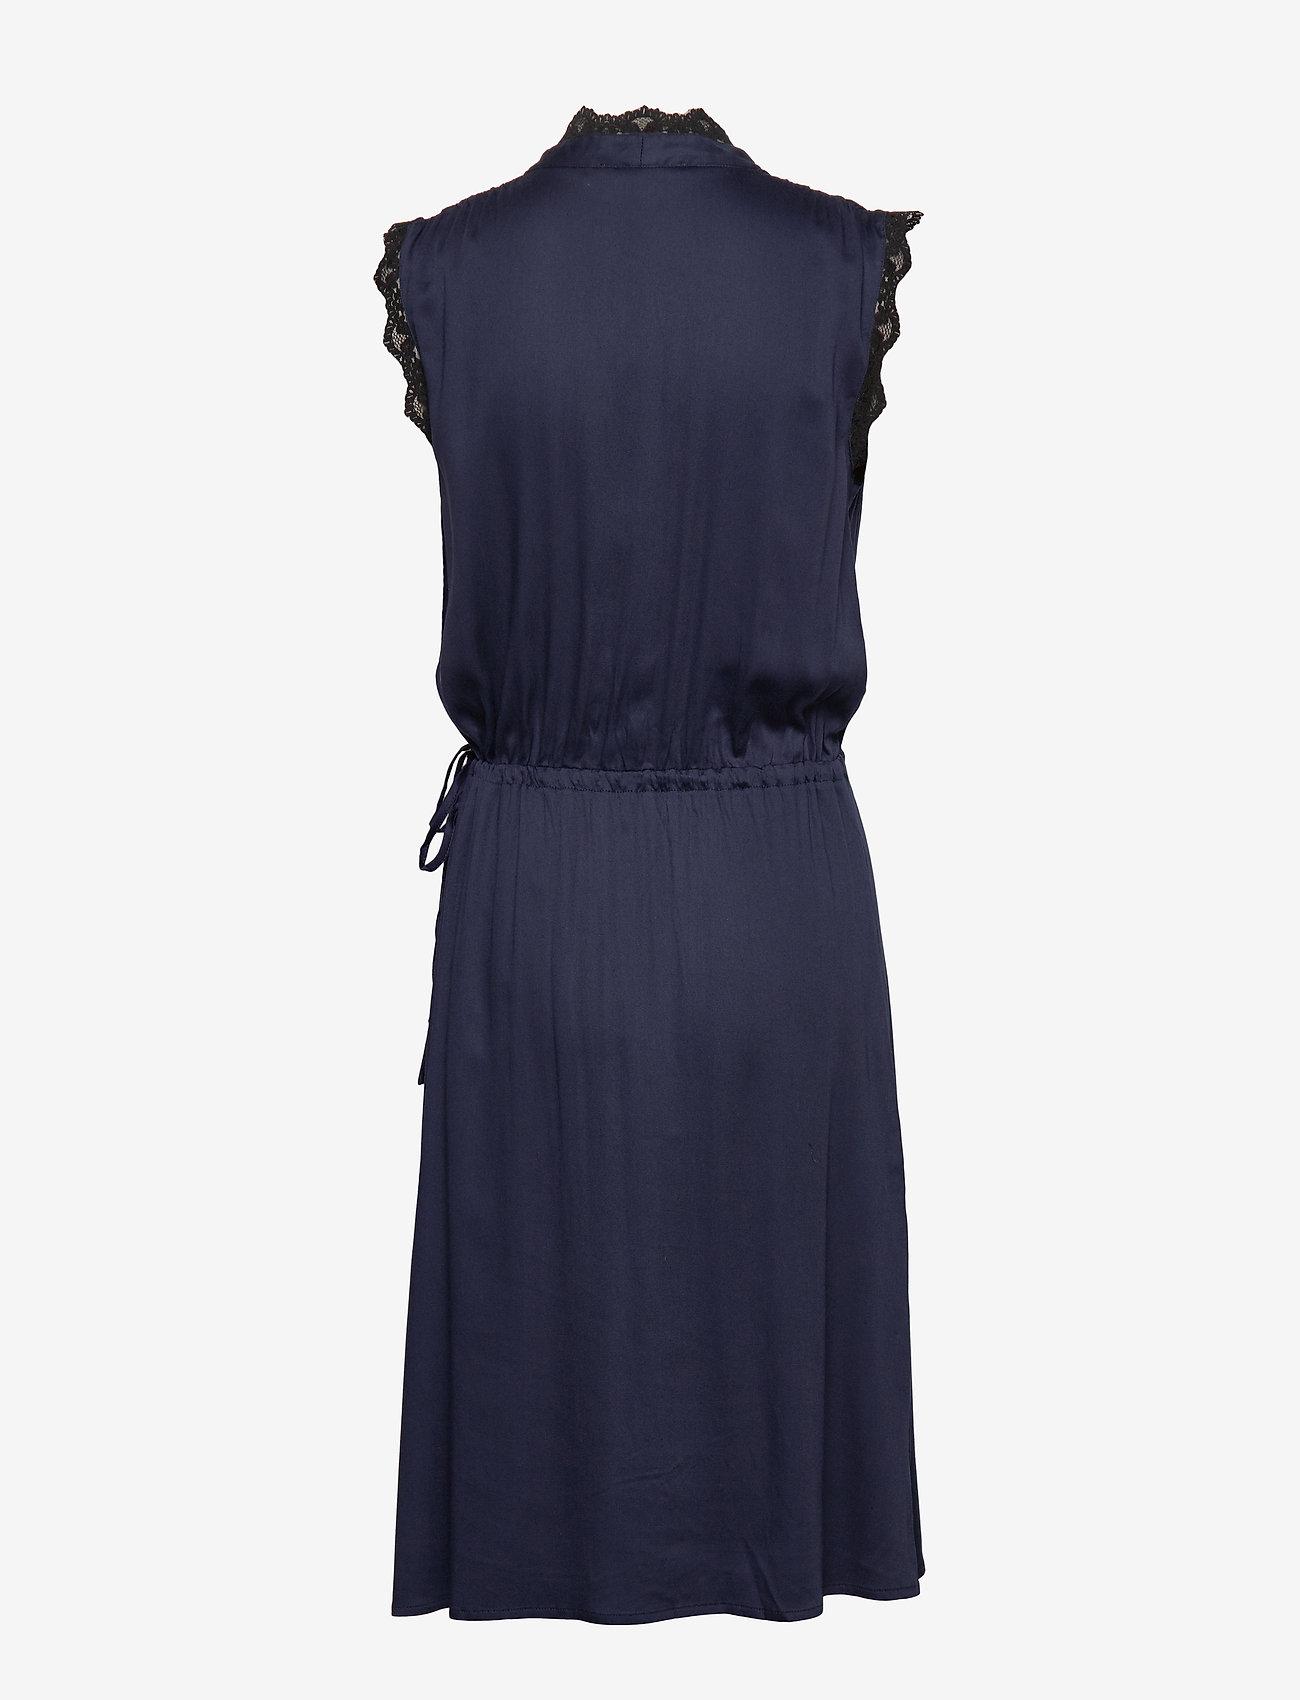 Rosemunde - Dress - robes portefeuille - navy - 1